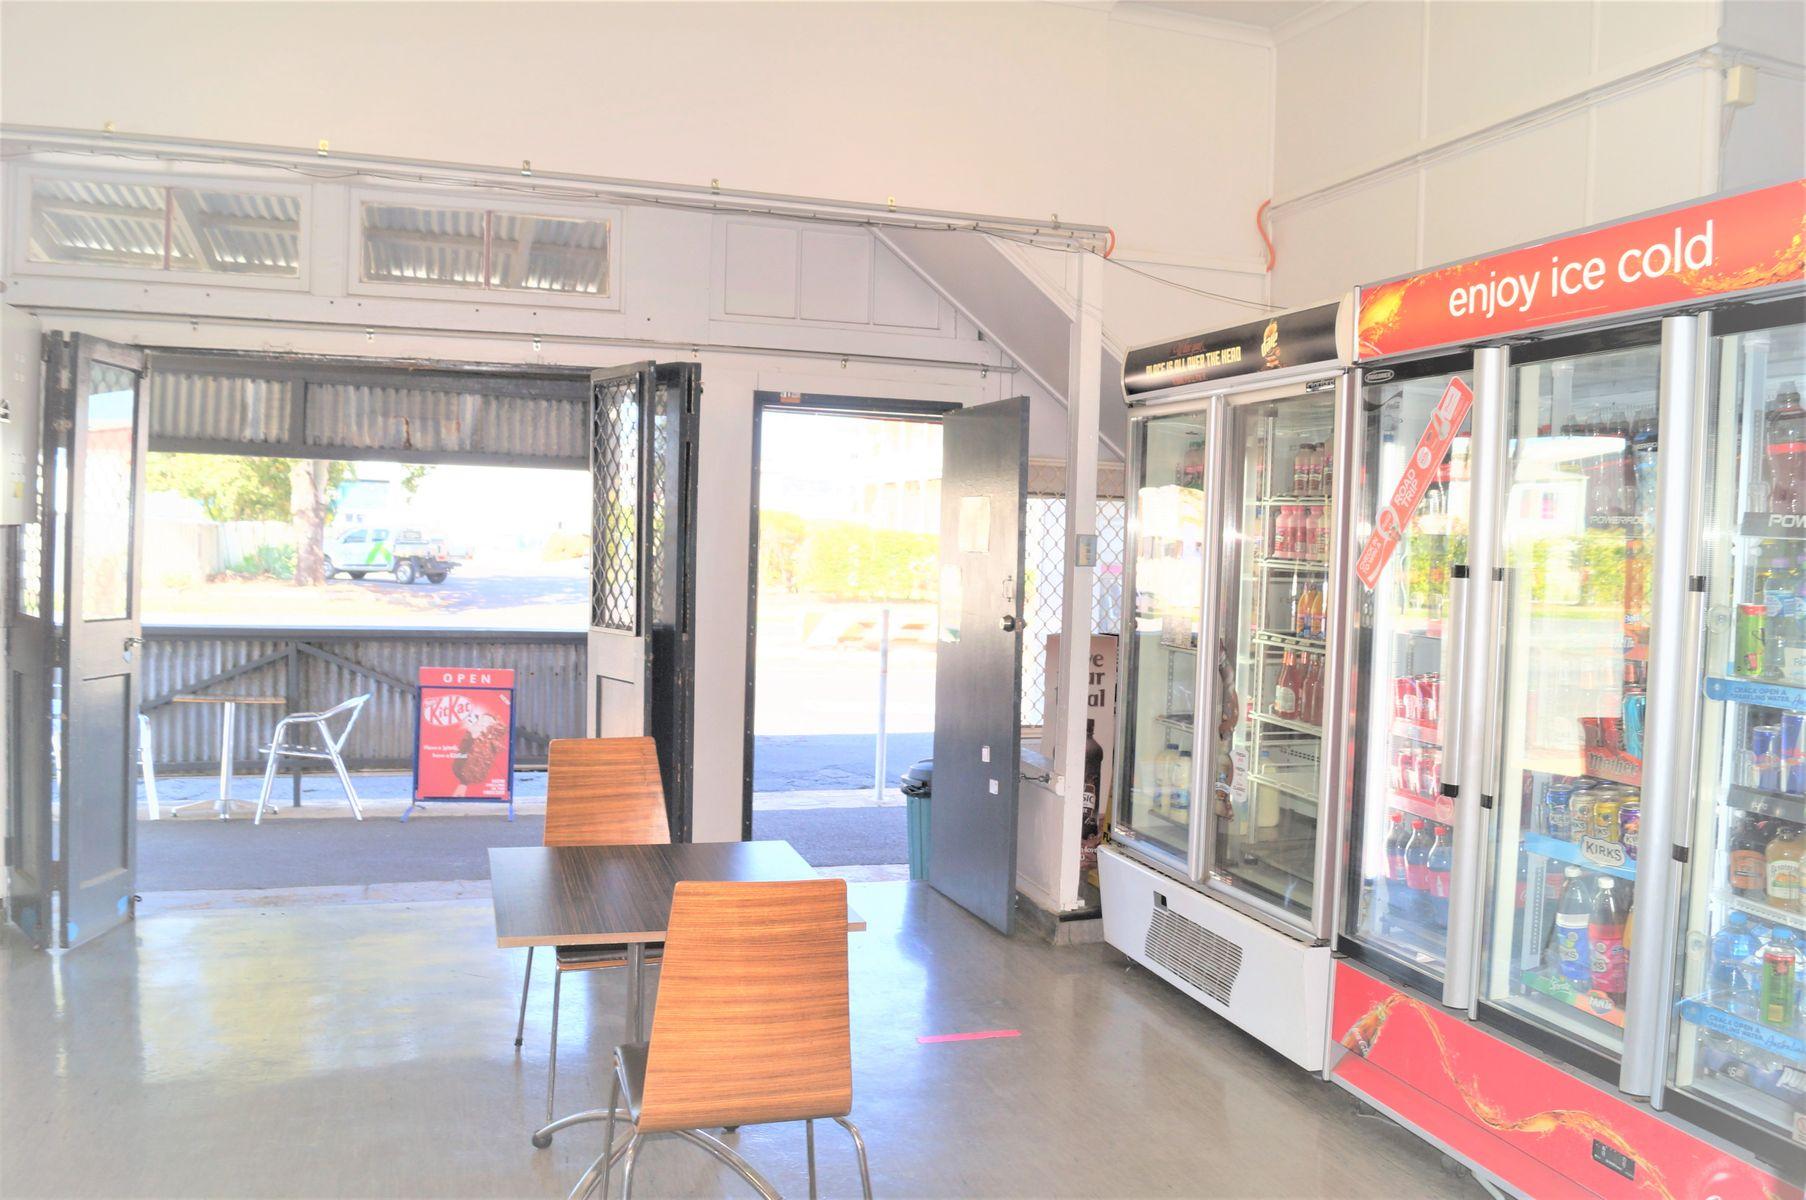 288B Denison Street, Rockhampton City, QLD 4700